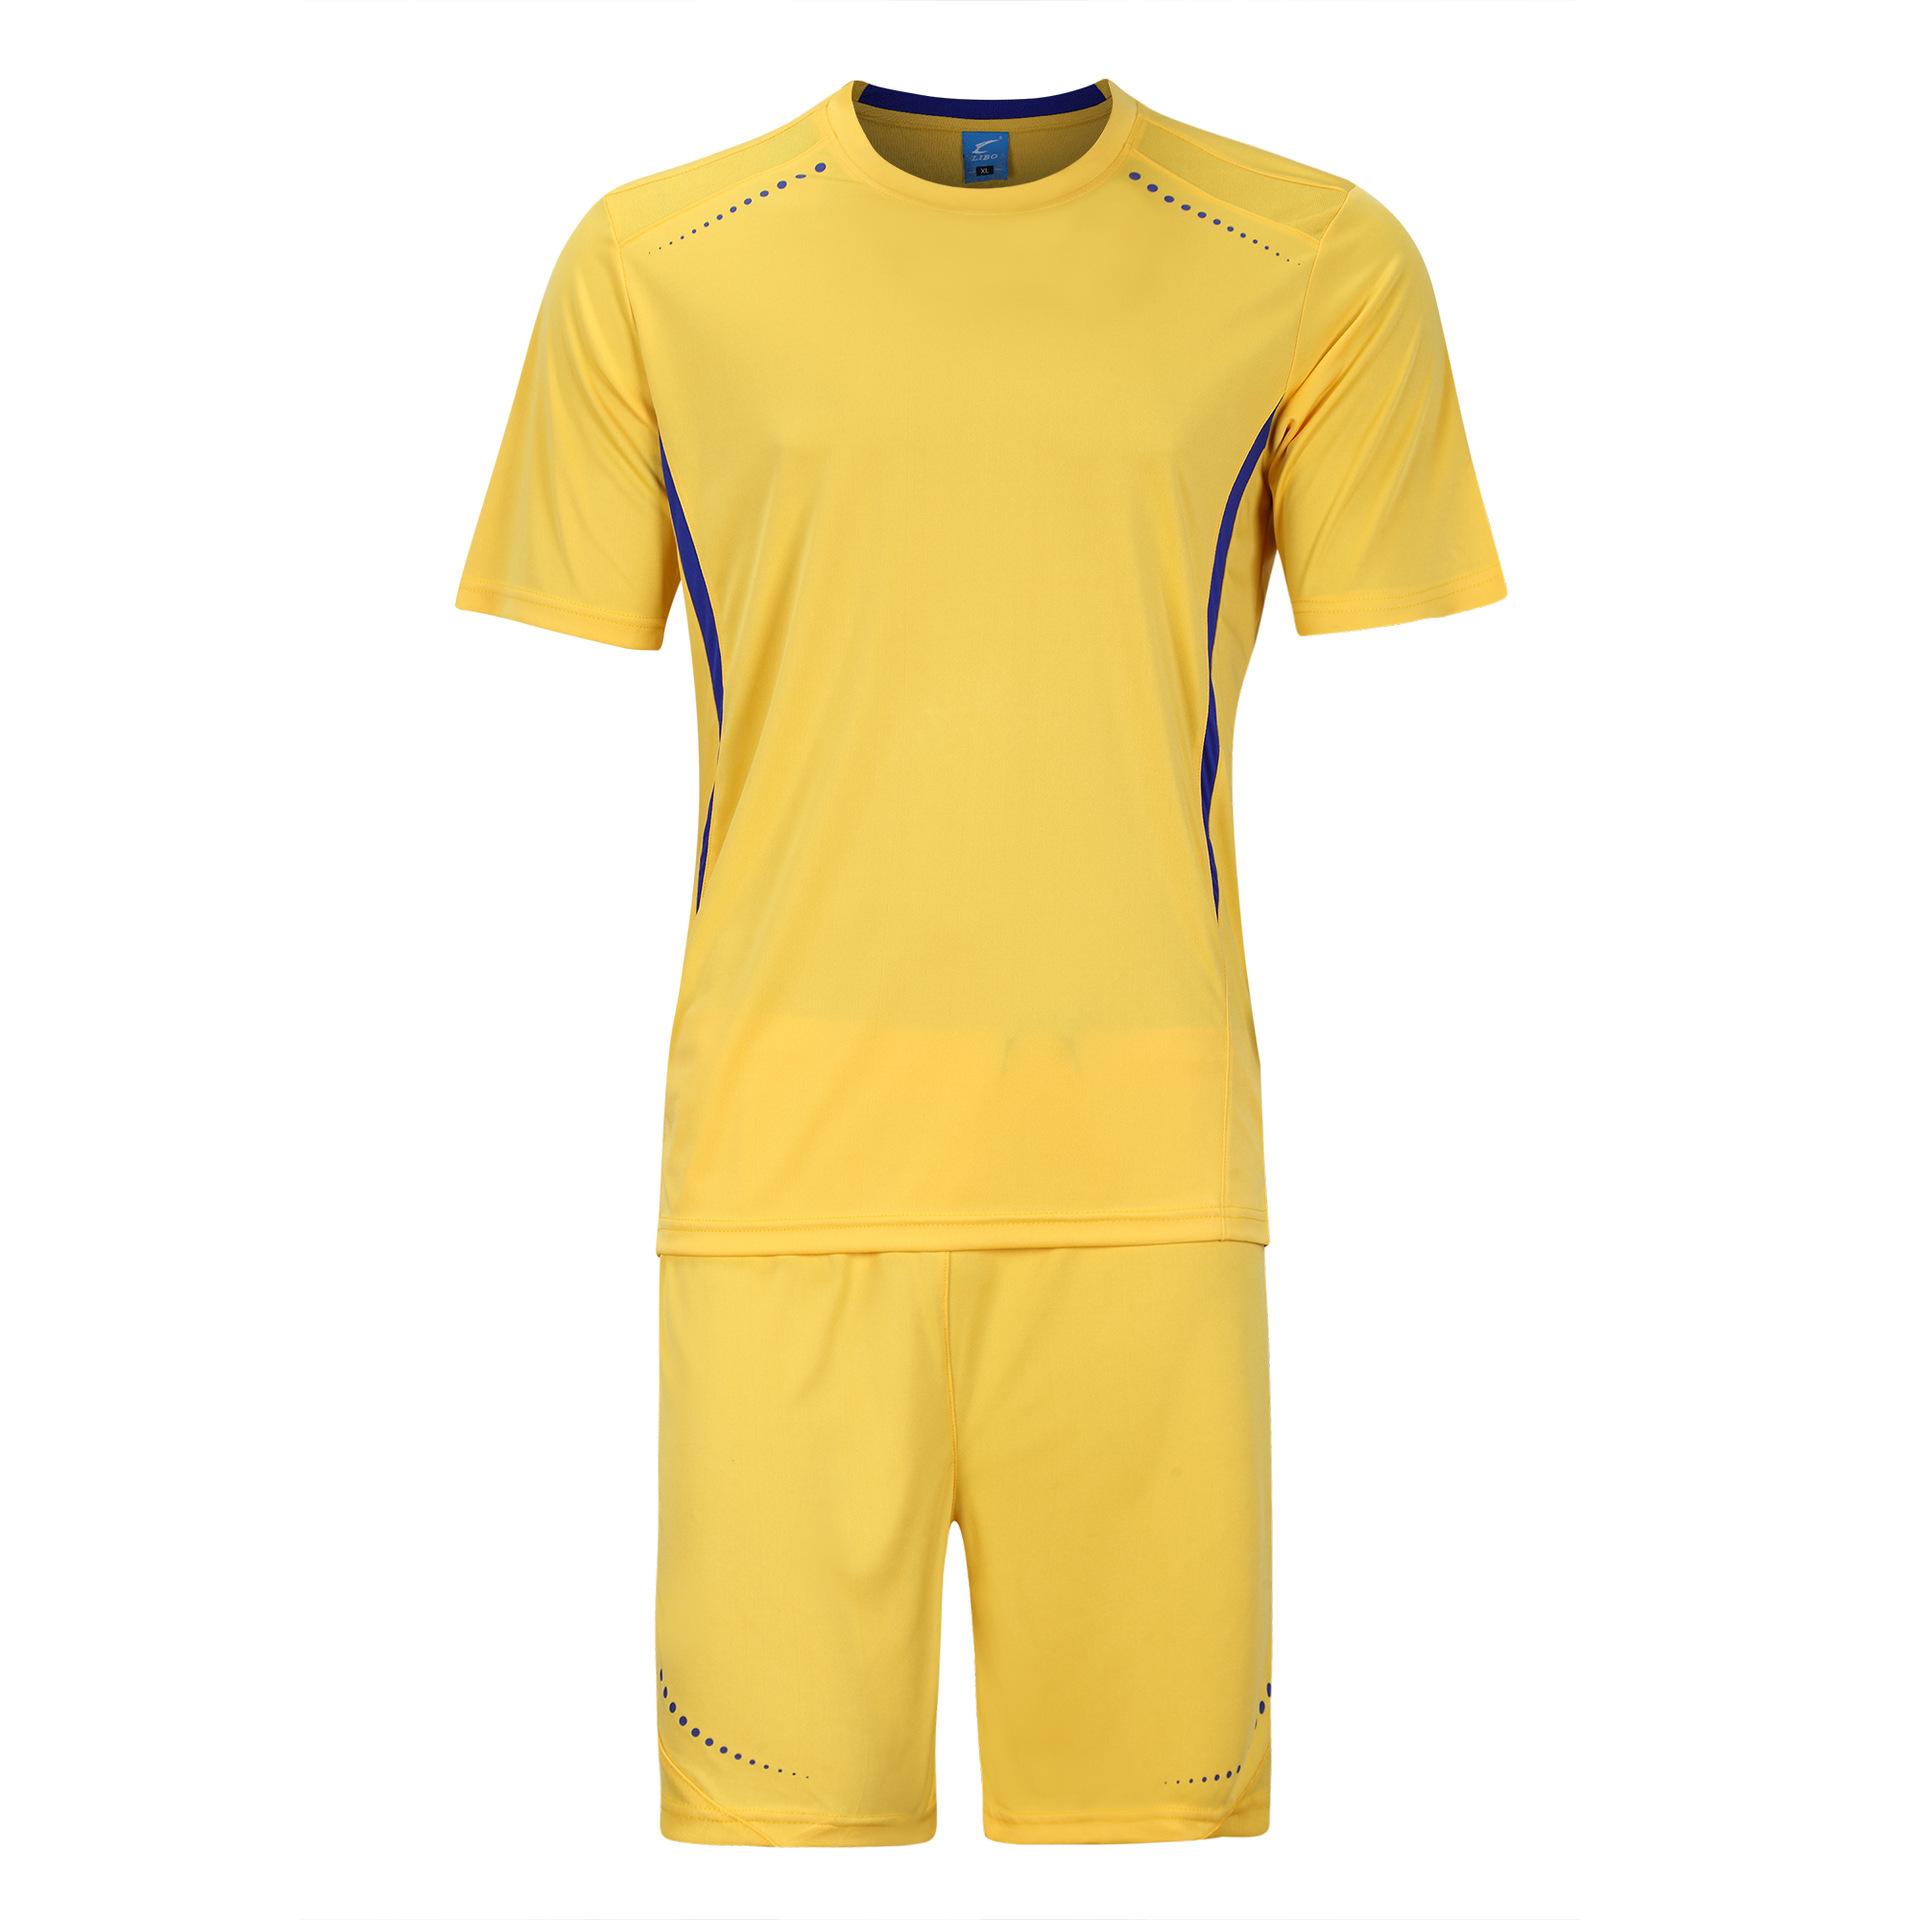 LIBO New Summer Quick Dry Men Soccer Football Jerseys Sets Short-sleeve SportsWear Jersey Training Suit Full Set Futbol Clothes(China (Mainland))